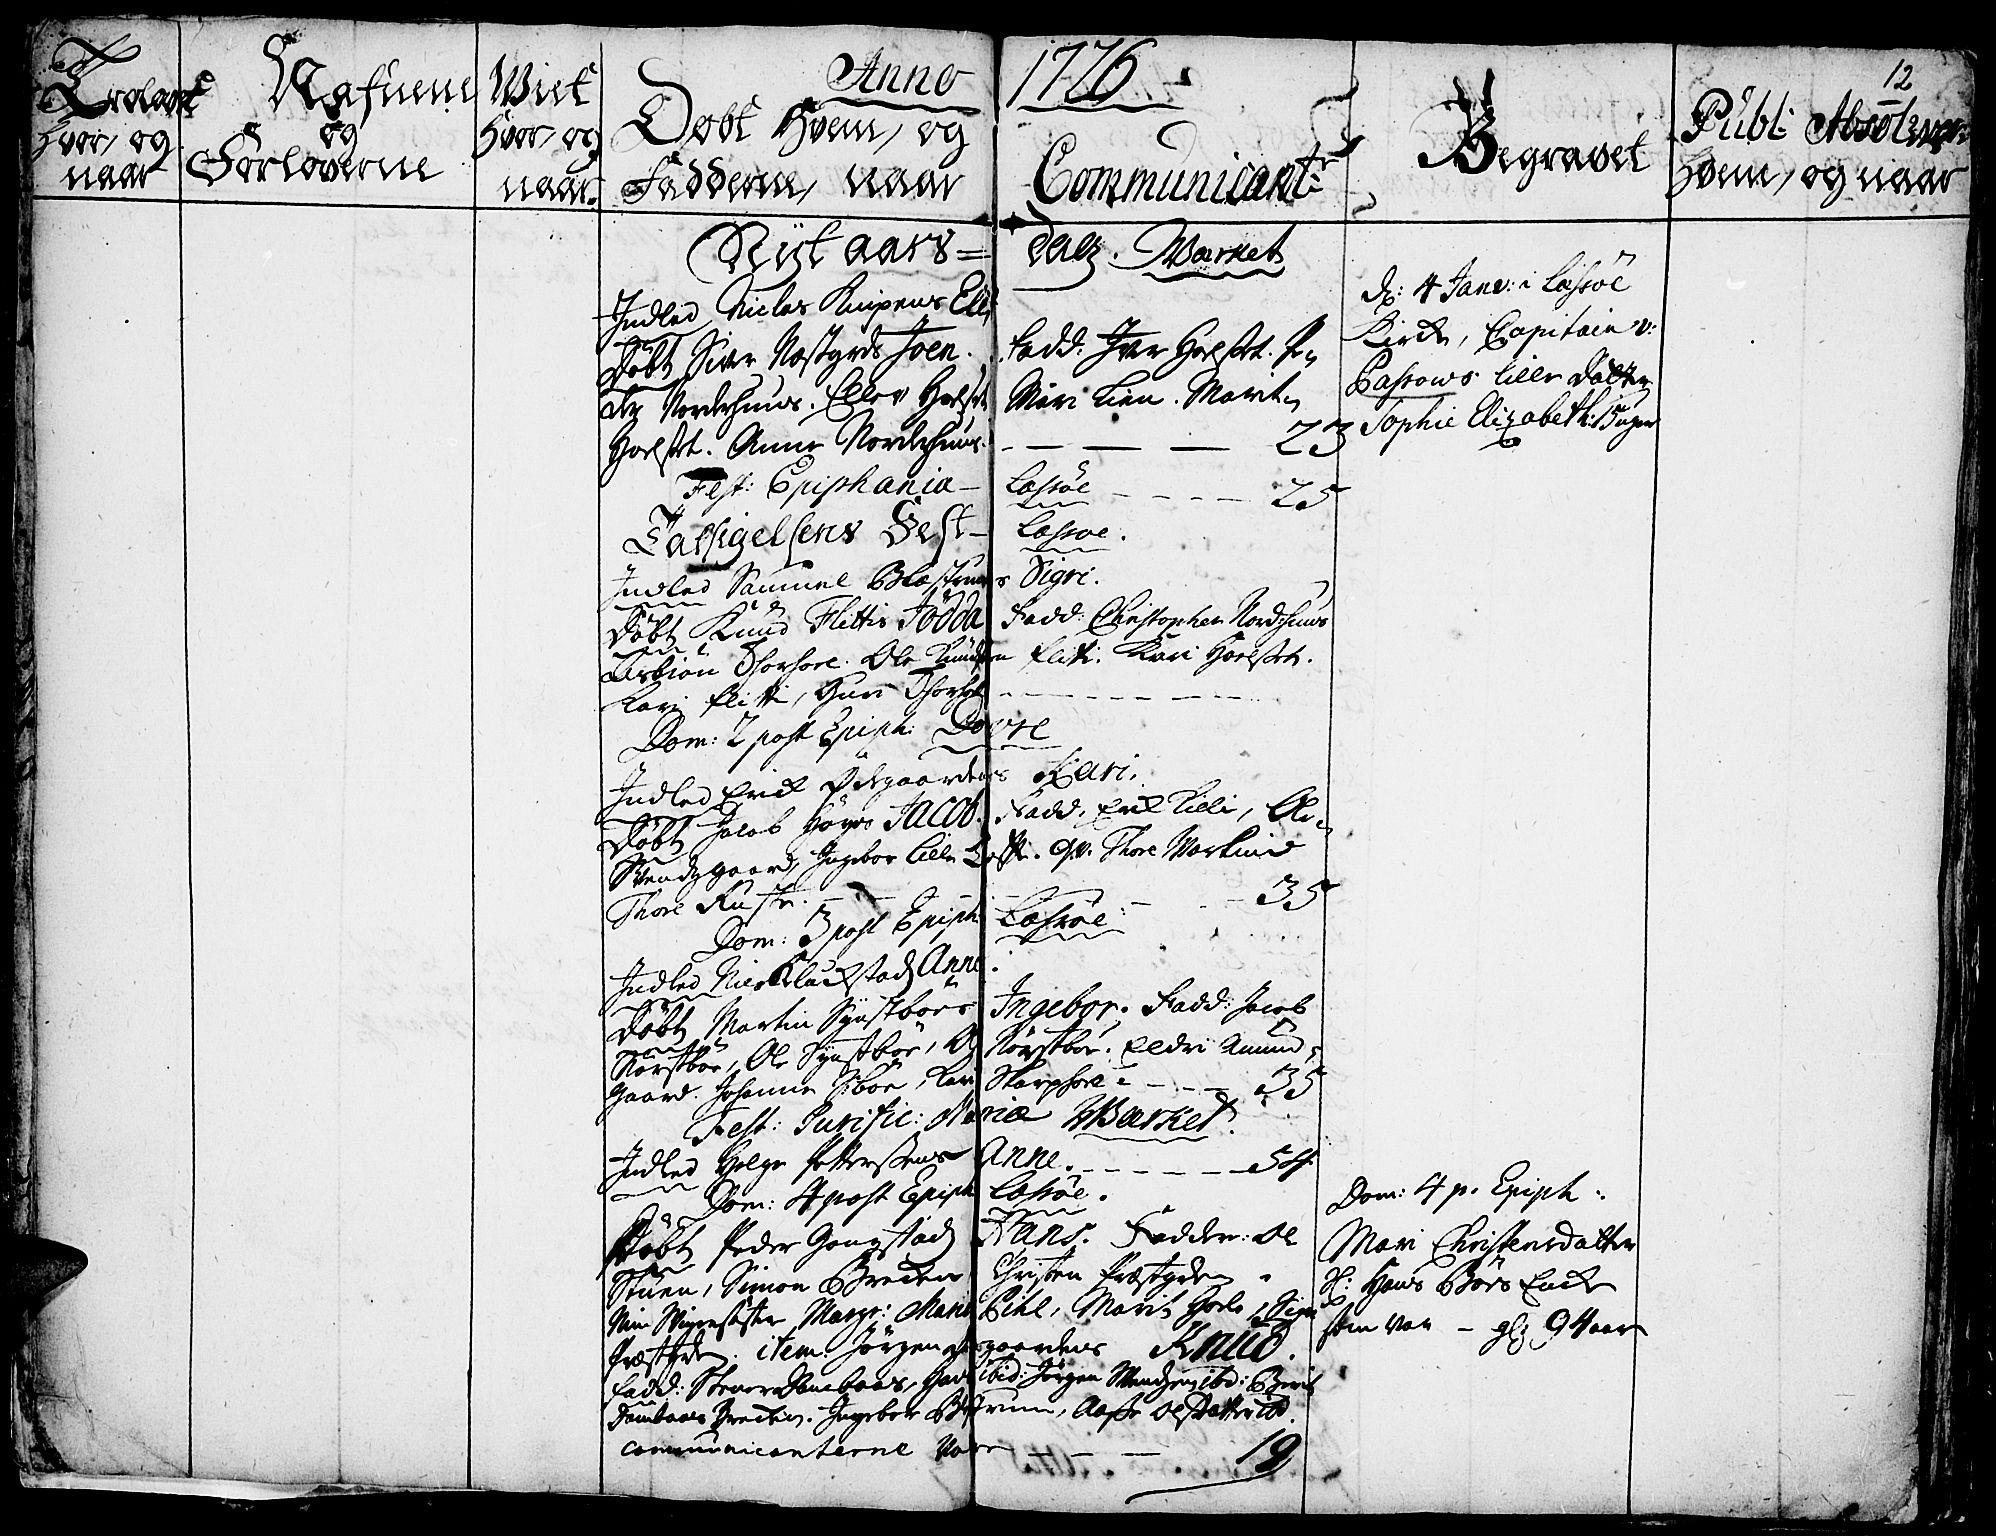 SAH, Lesja prestekontor, Ministerialbok nr. 1, 1724-1731, s. 12